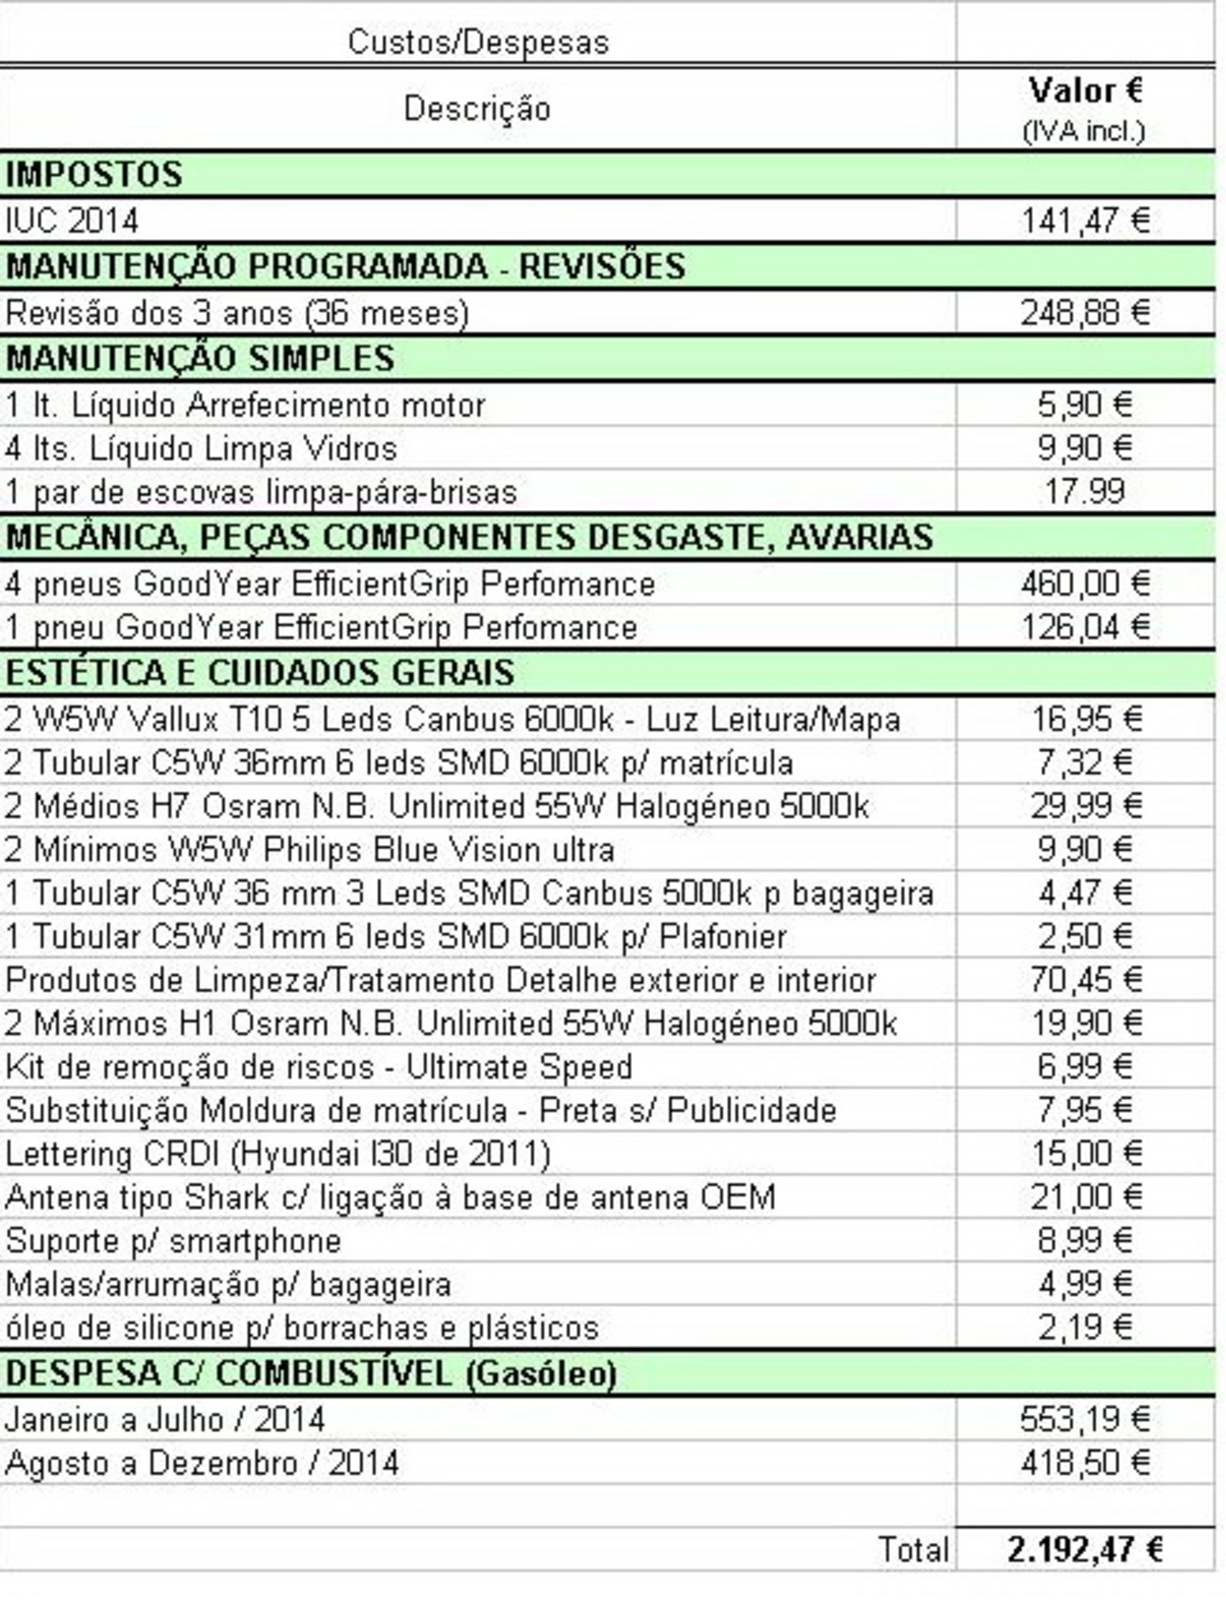 Kia Cee'd ED 1.6 CRDI TX (04.2011)  - Página 4 Despesa_2014